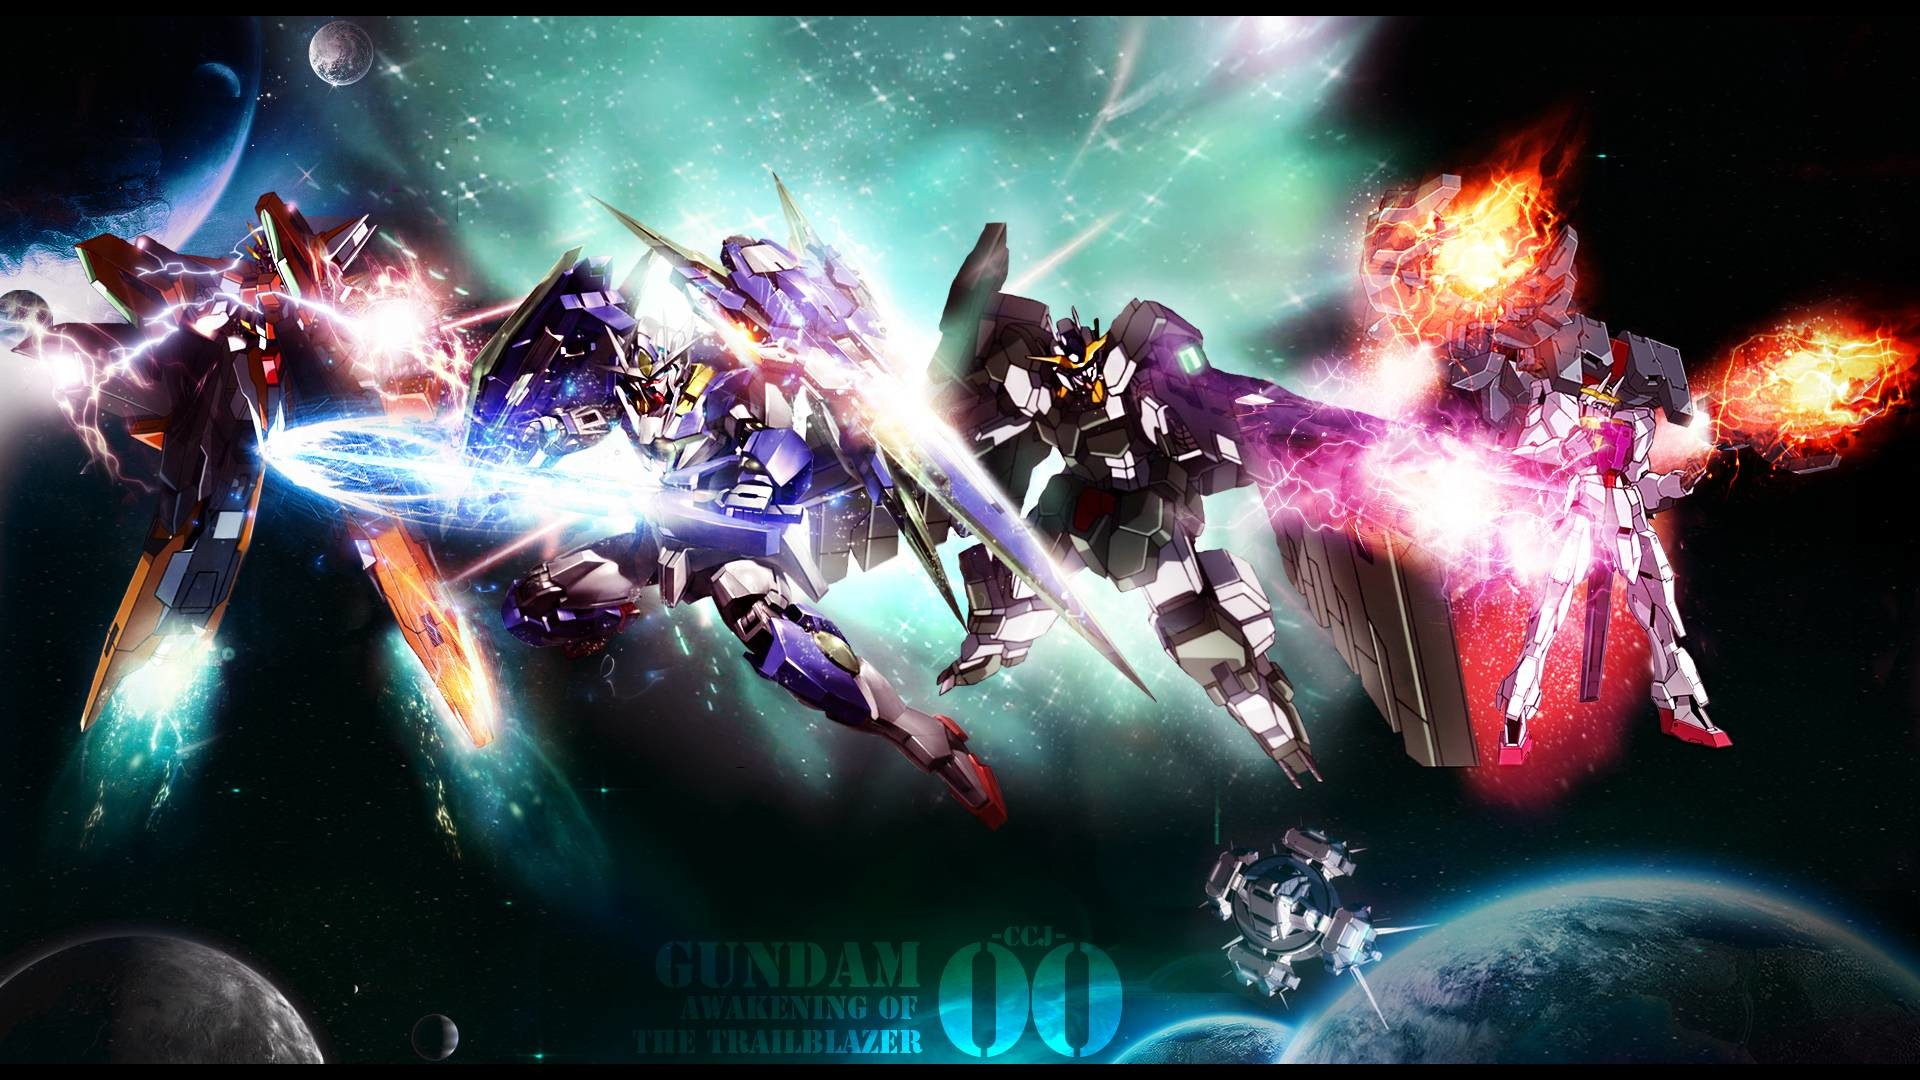 awakening of the trailblazer – Gundam 00 Wallpaper